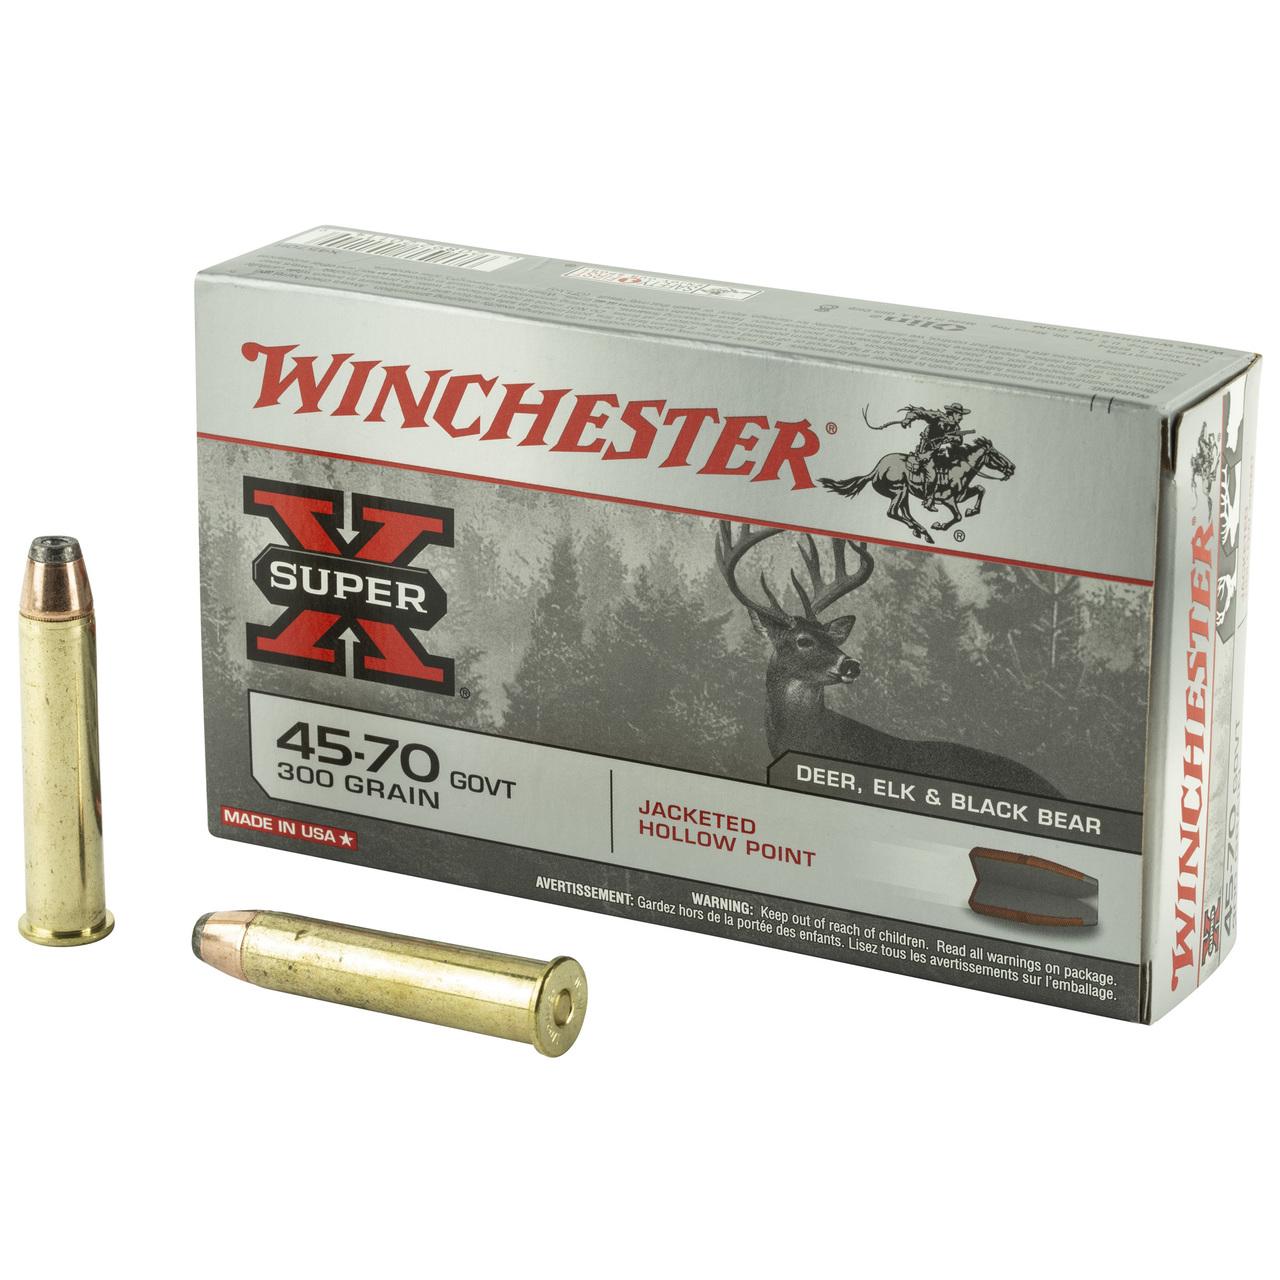 Rifle Ammo -  45-70 - 2A Warehouse